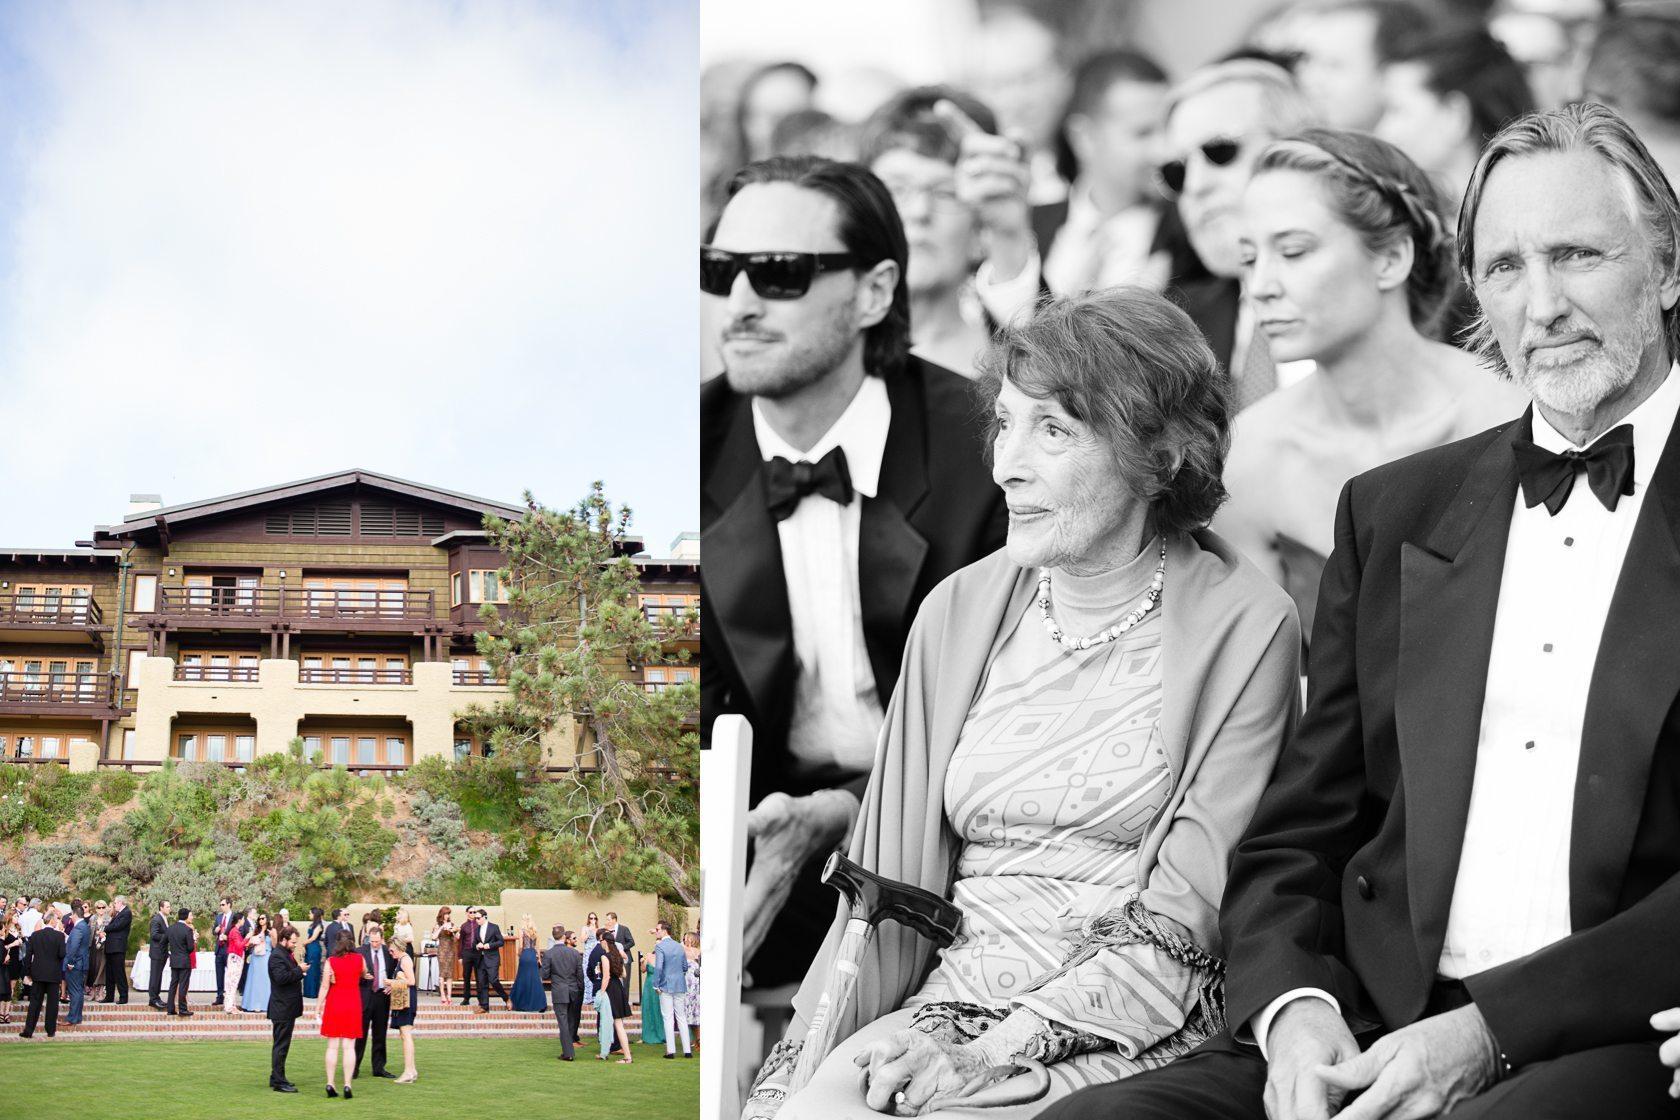 The_Lodge_at_Torrey_Pines_Wedding_031.jpg